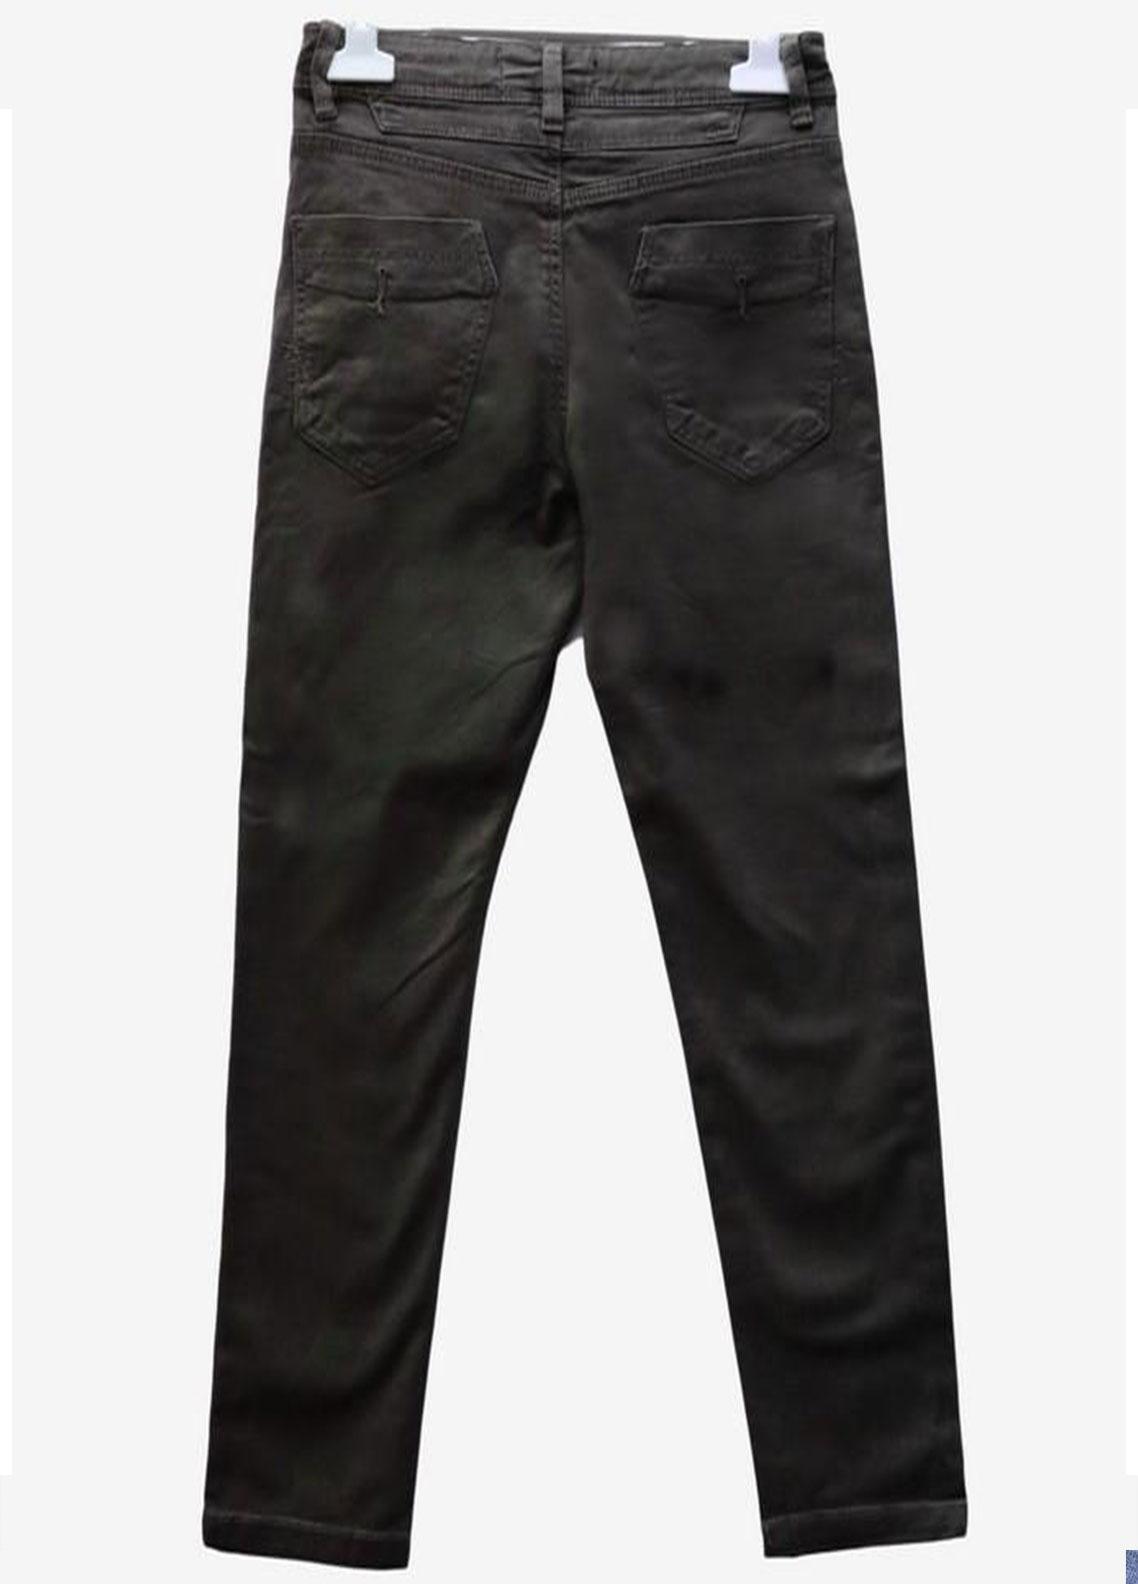 Ignite Wardrobe Pigmet Dyed Boys Pants -  IG20PNK 008